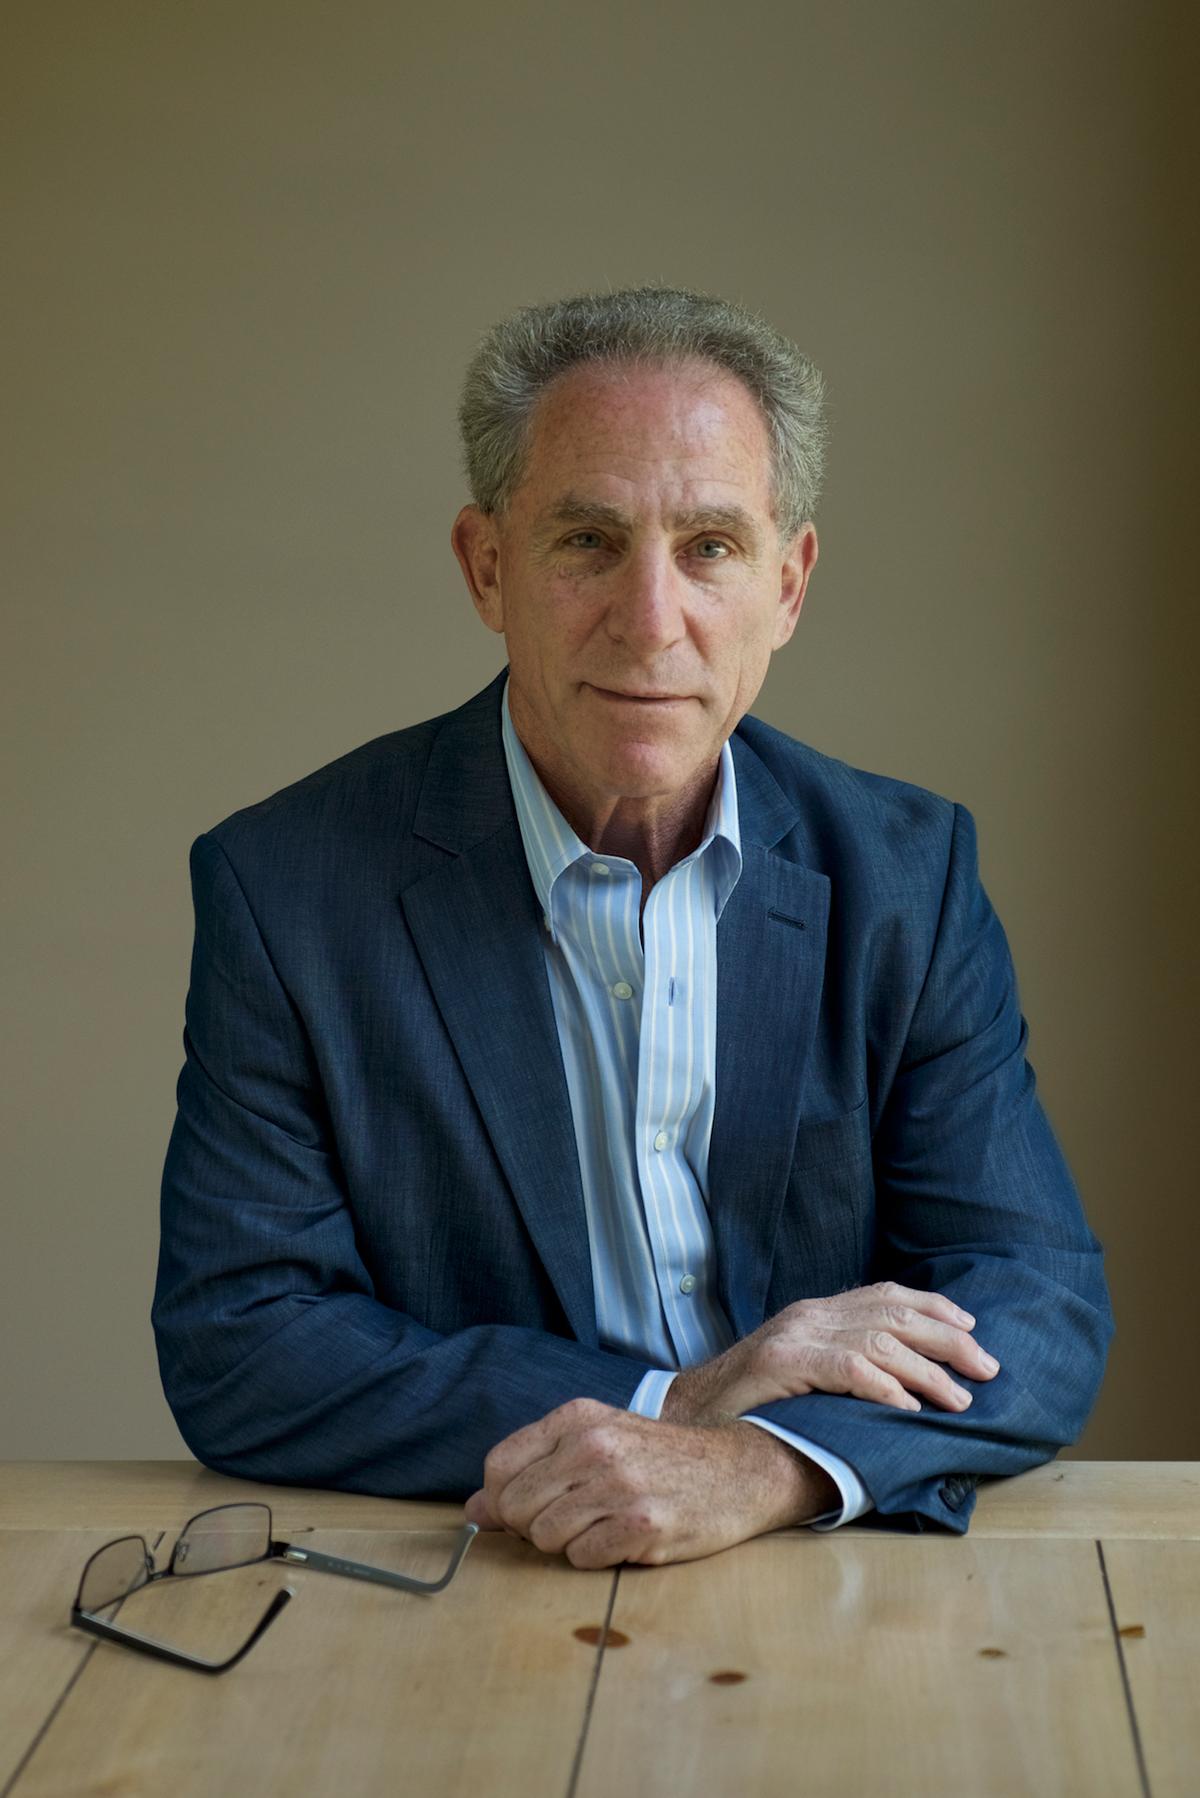 Phillip D. Kouffman, President